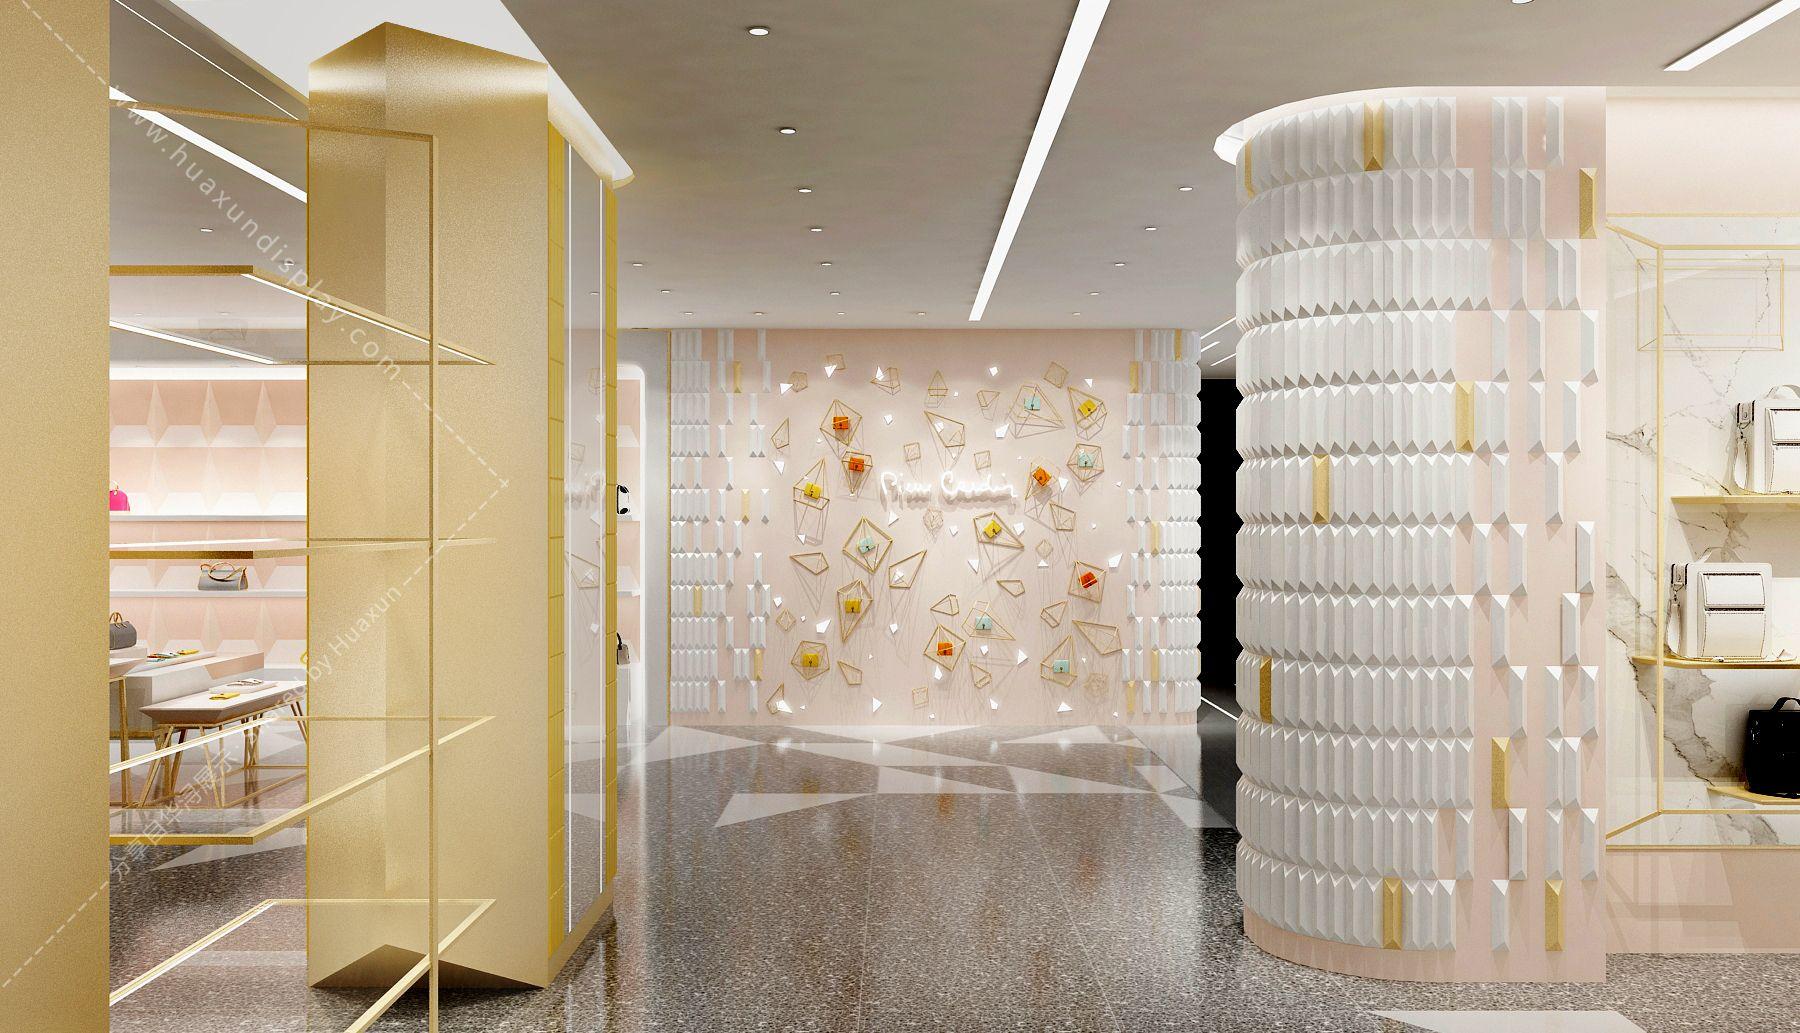 Pierre Cardin Bag Showroom Design Bag Shop Display Retailprojecting Designshop Shopfit Home Decor Decor Bag Store